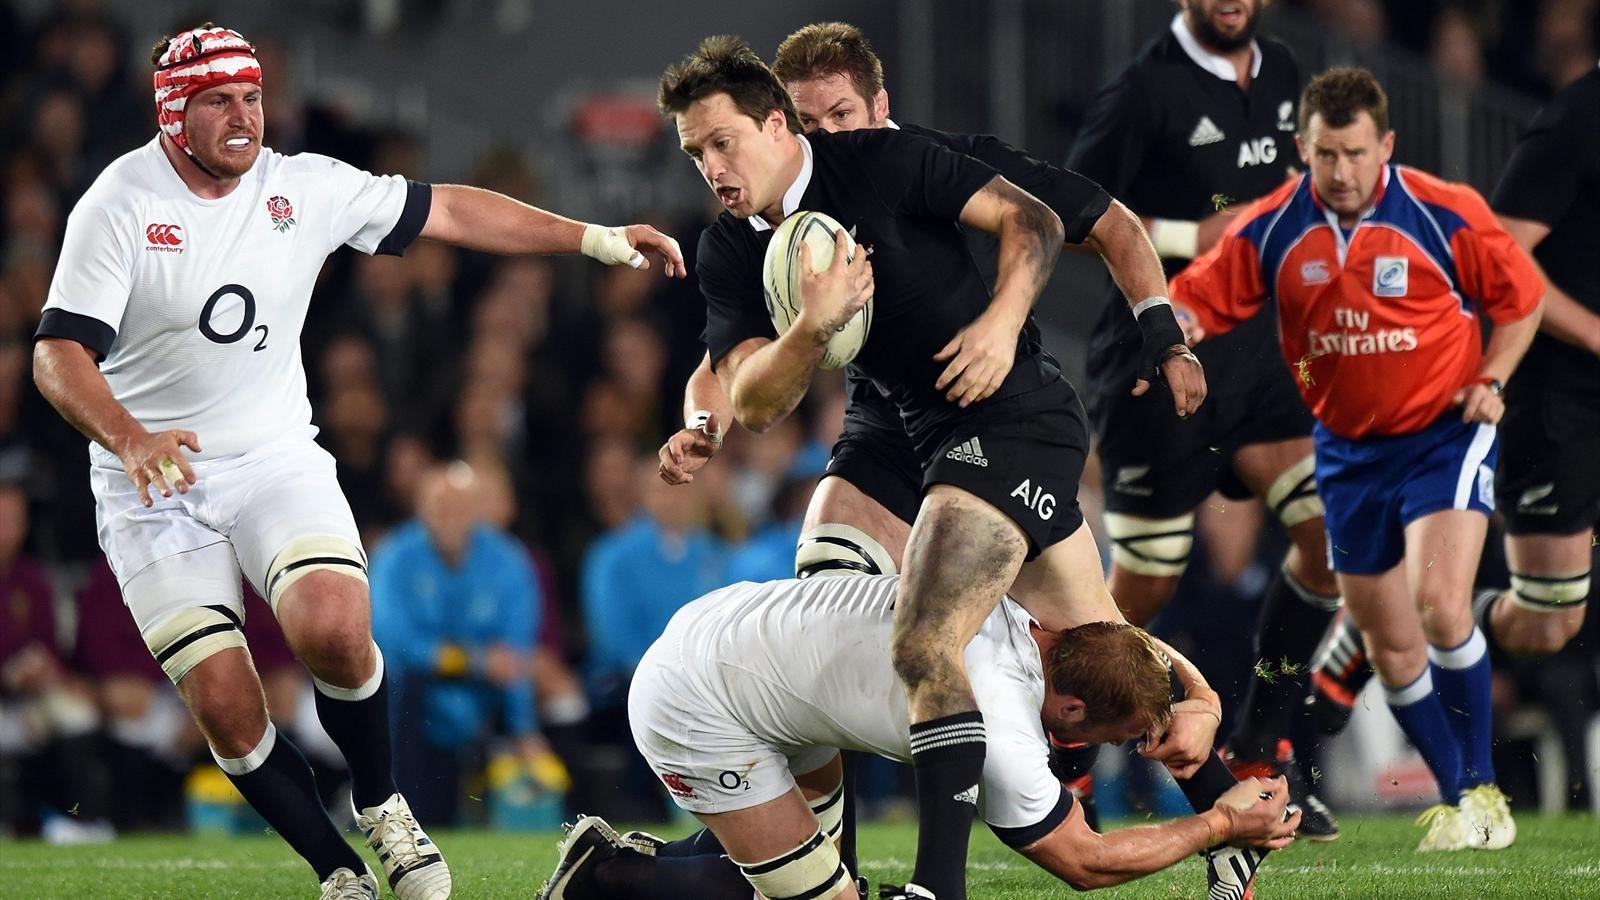 Nouvelle Zelande Angleterre 28 27 Encore Chahutes Les All Blacks S En Sortent In Extremis Rugby Nouvelle Zelande Zelande